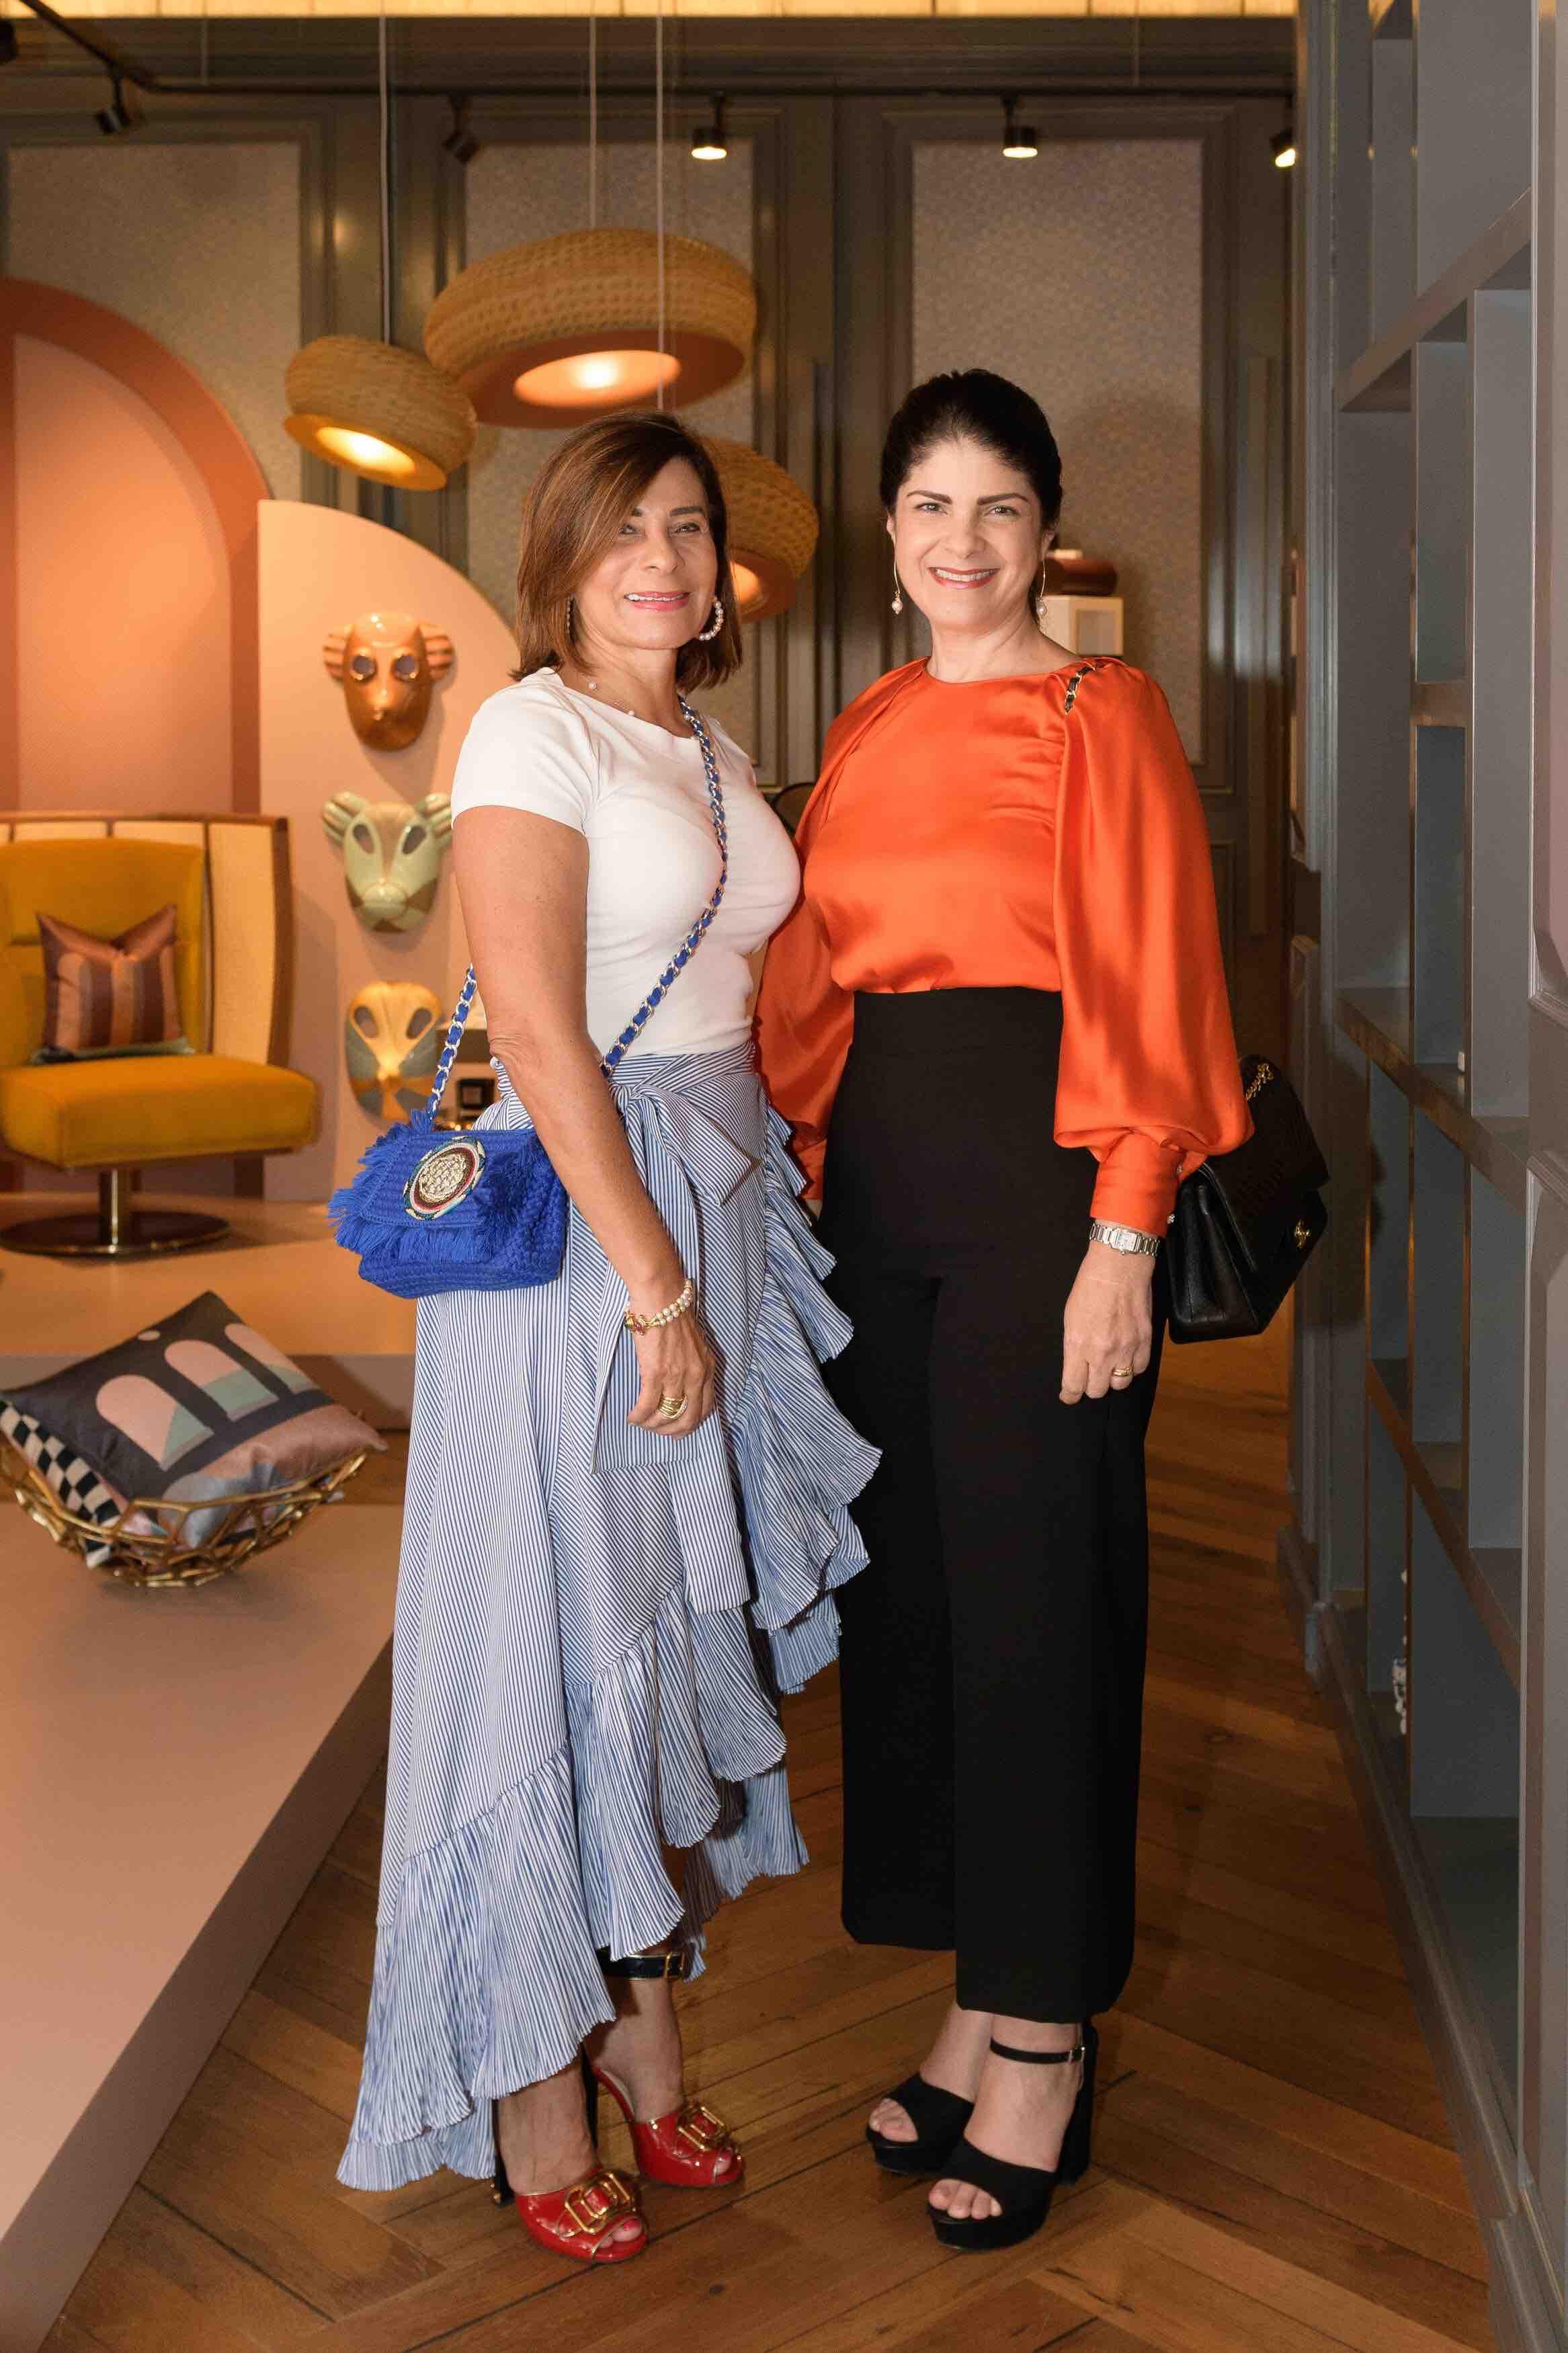 7. Patricia Alvarez & Dalia Sued